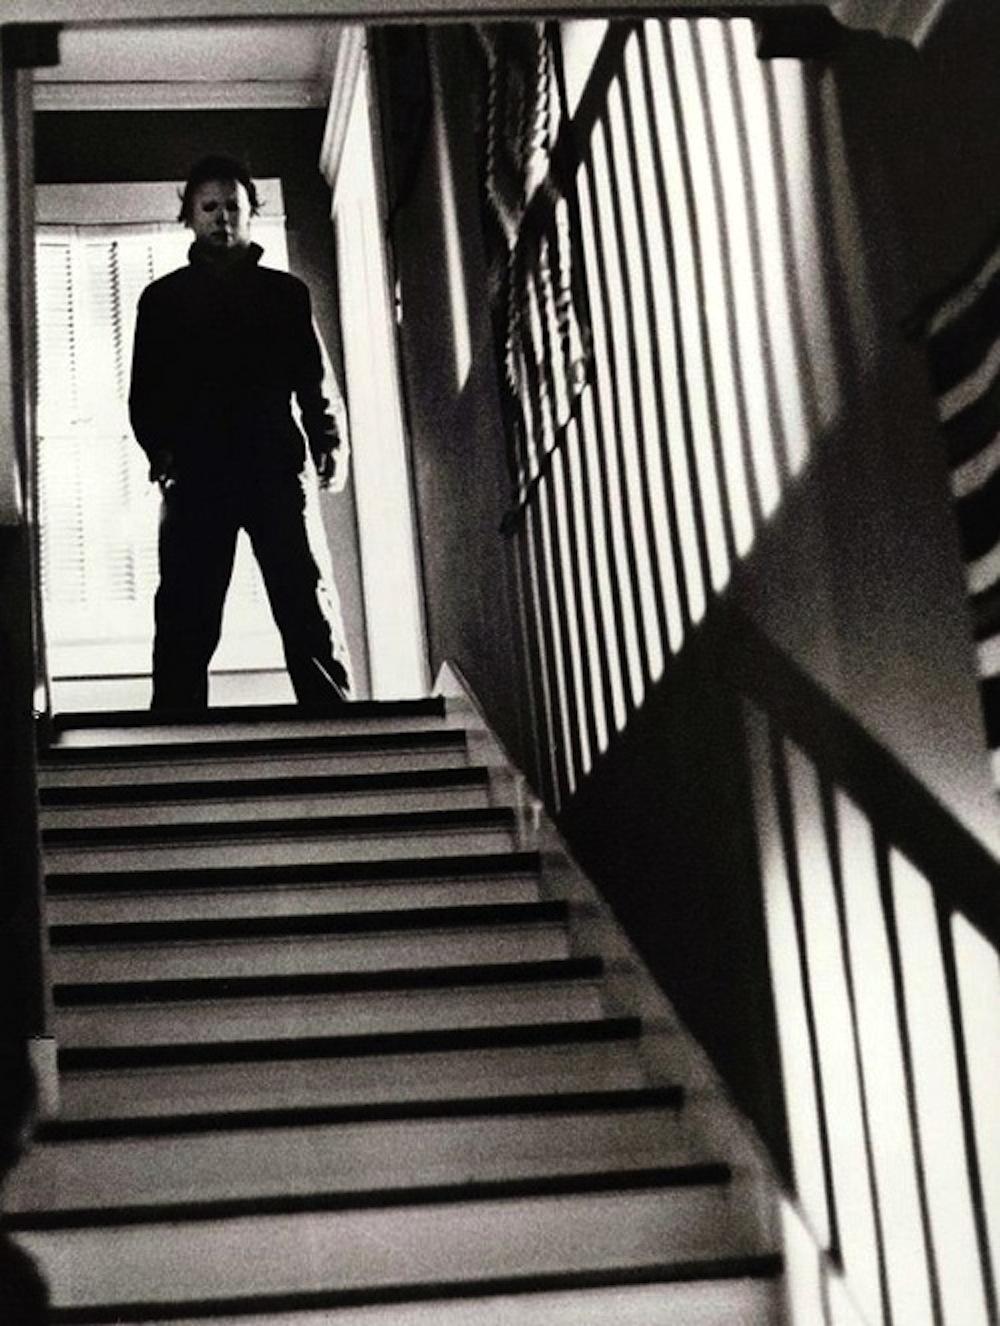 Halloween John Carpenter Michael Myers MovieSpoon.com